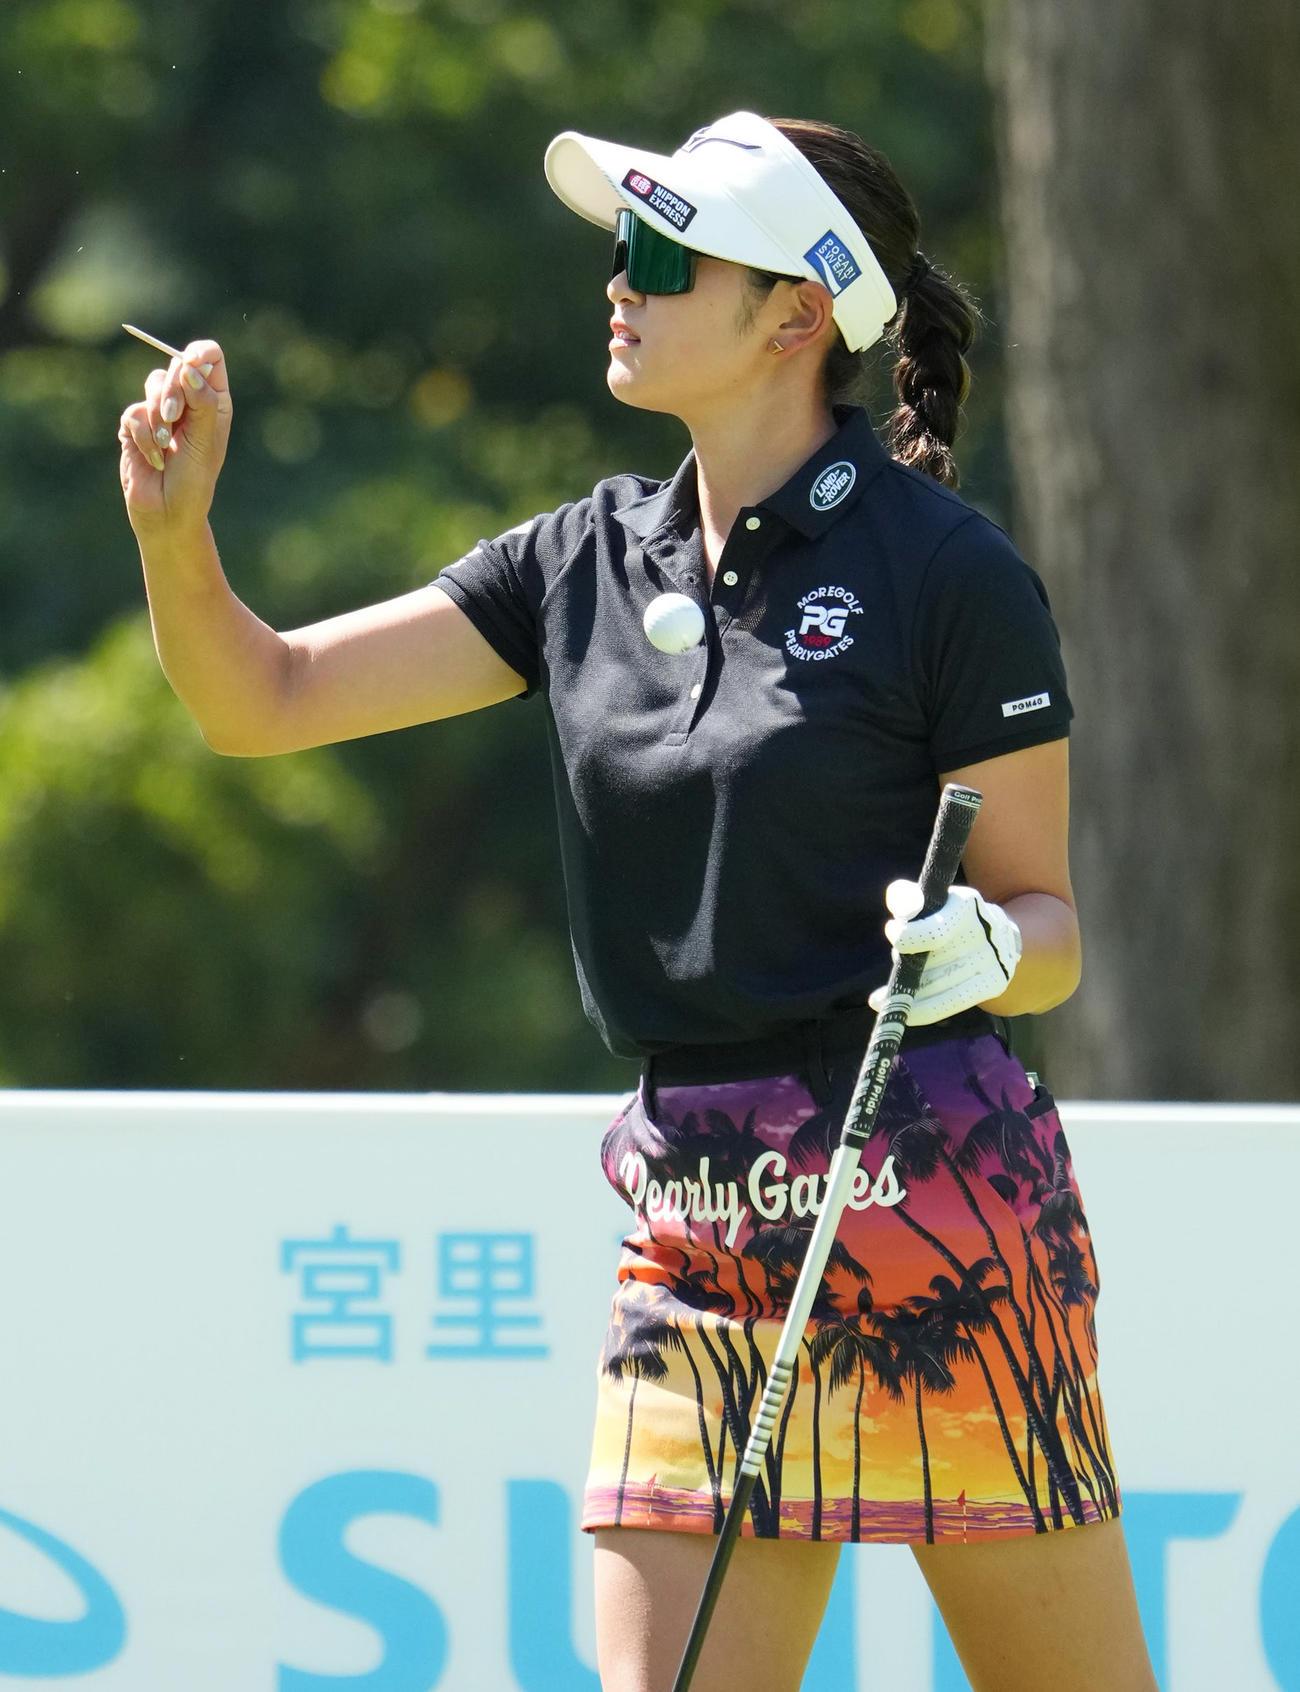 https://www.nikkansports.com/sports/golf/news/img/202106090000304-w1300_3.jpg